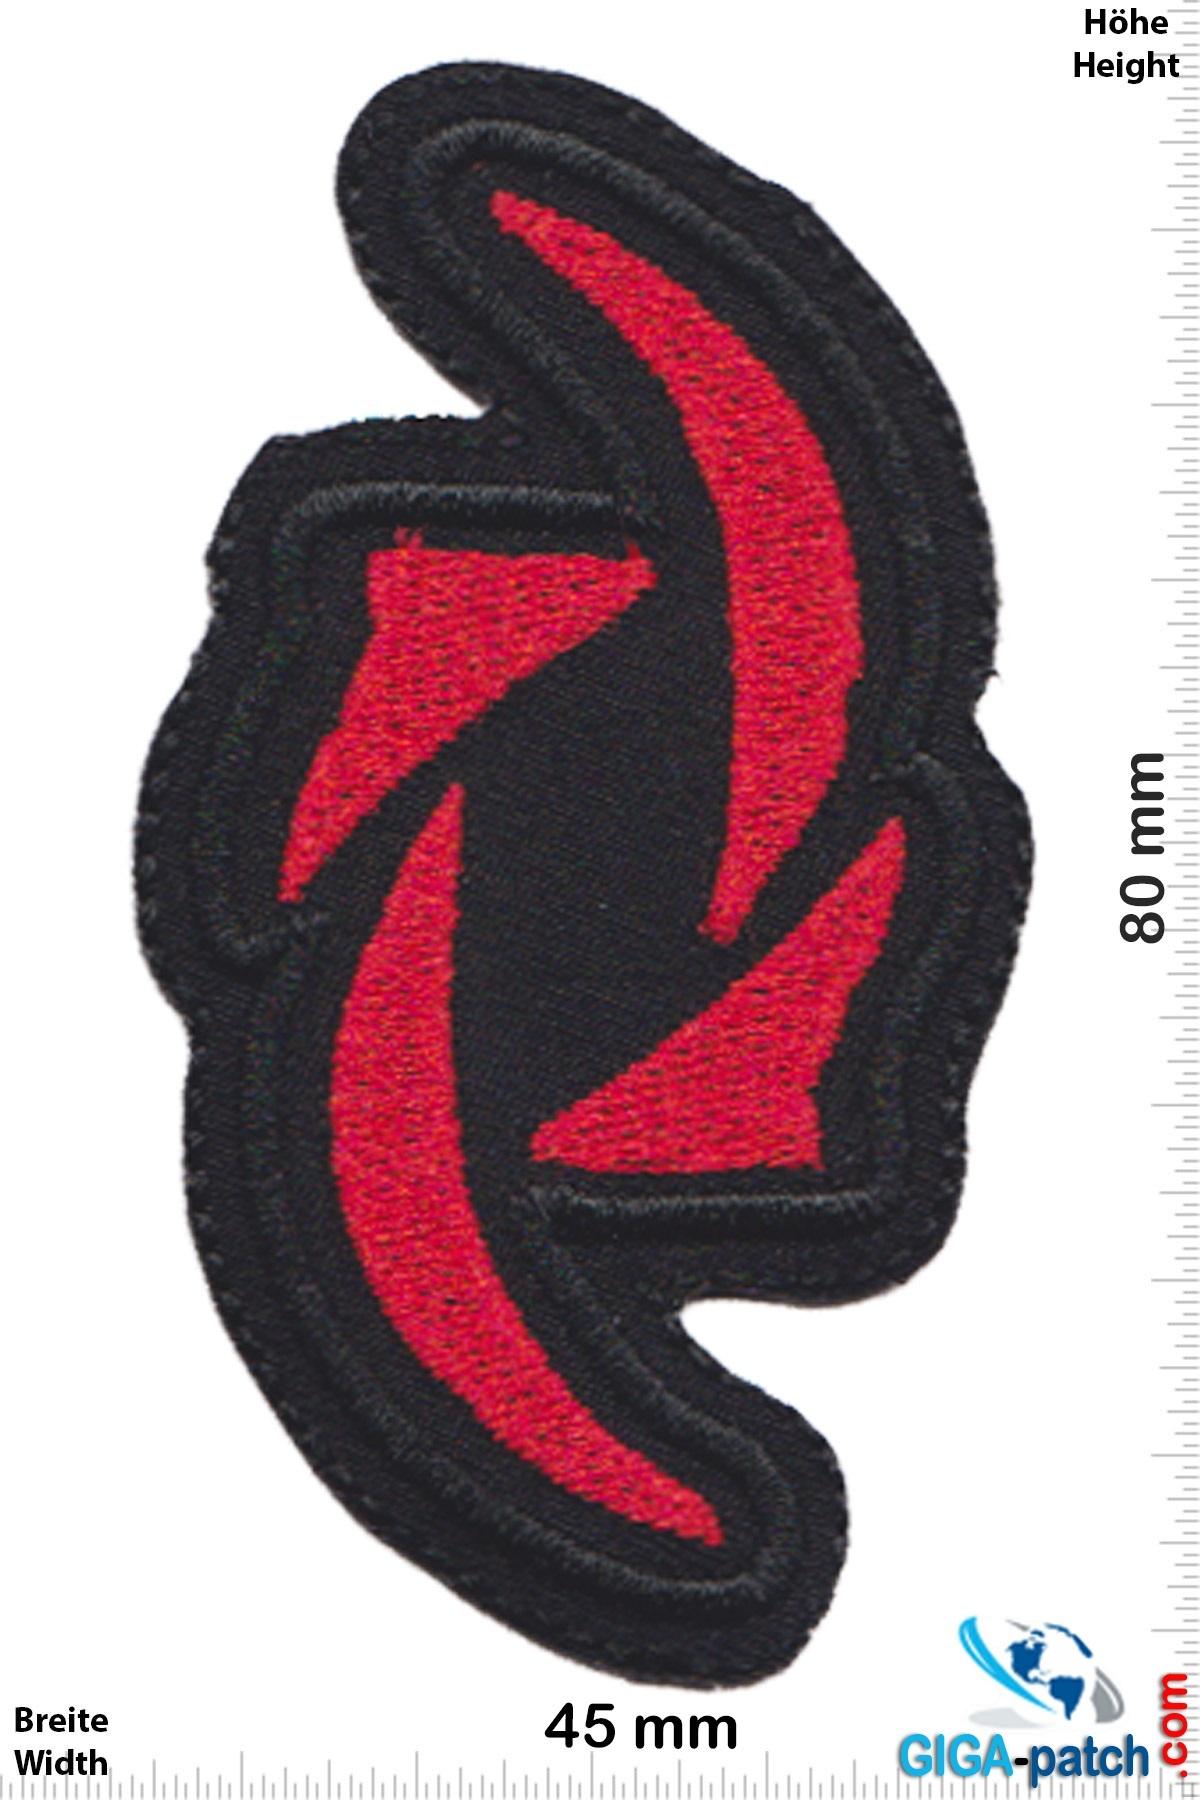 Halestorm Halestorm - Logo - US Rockband